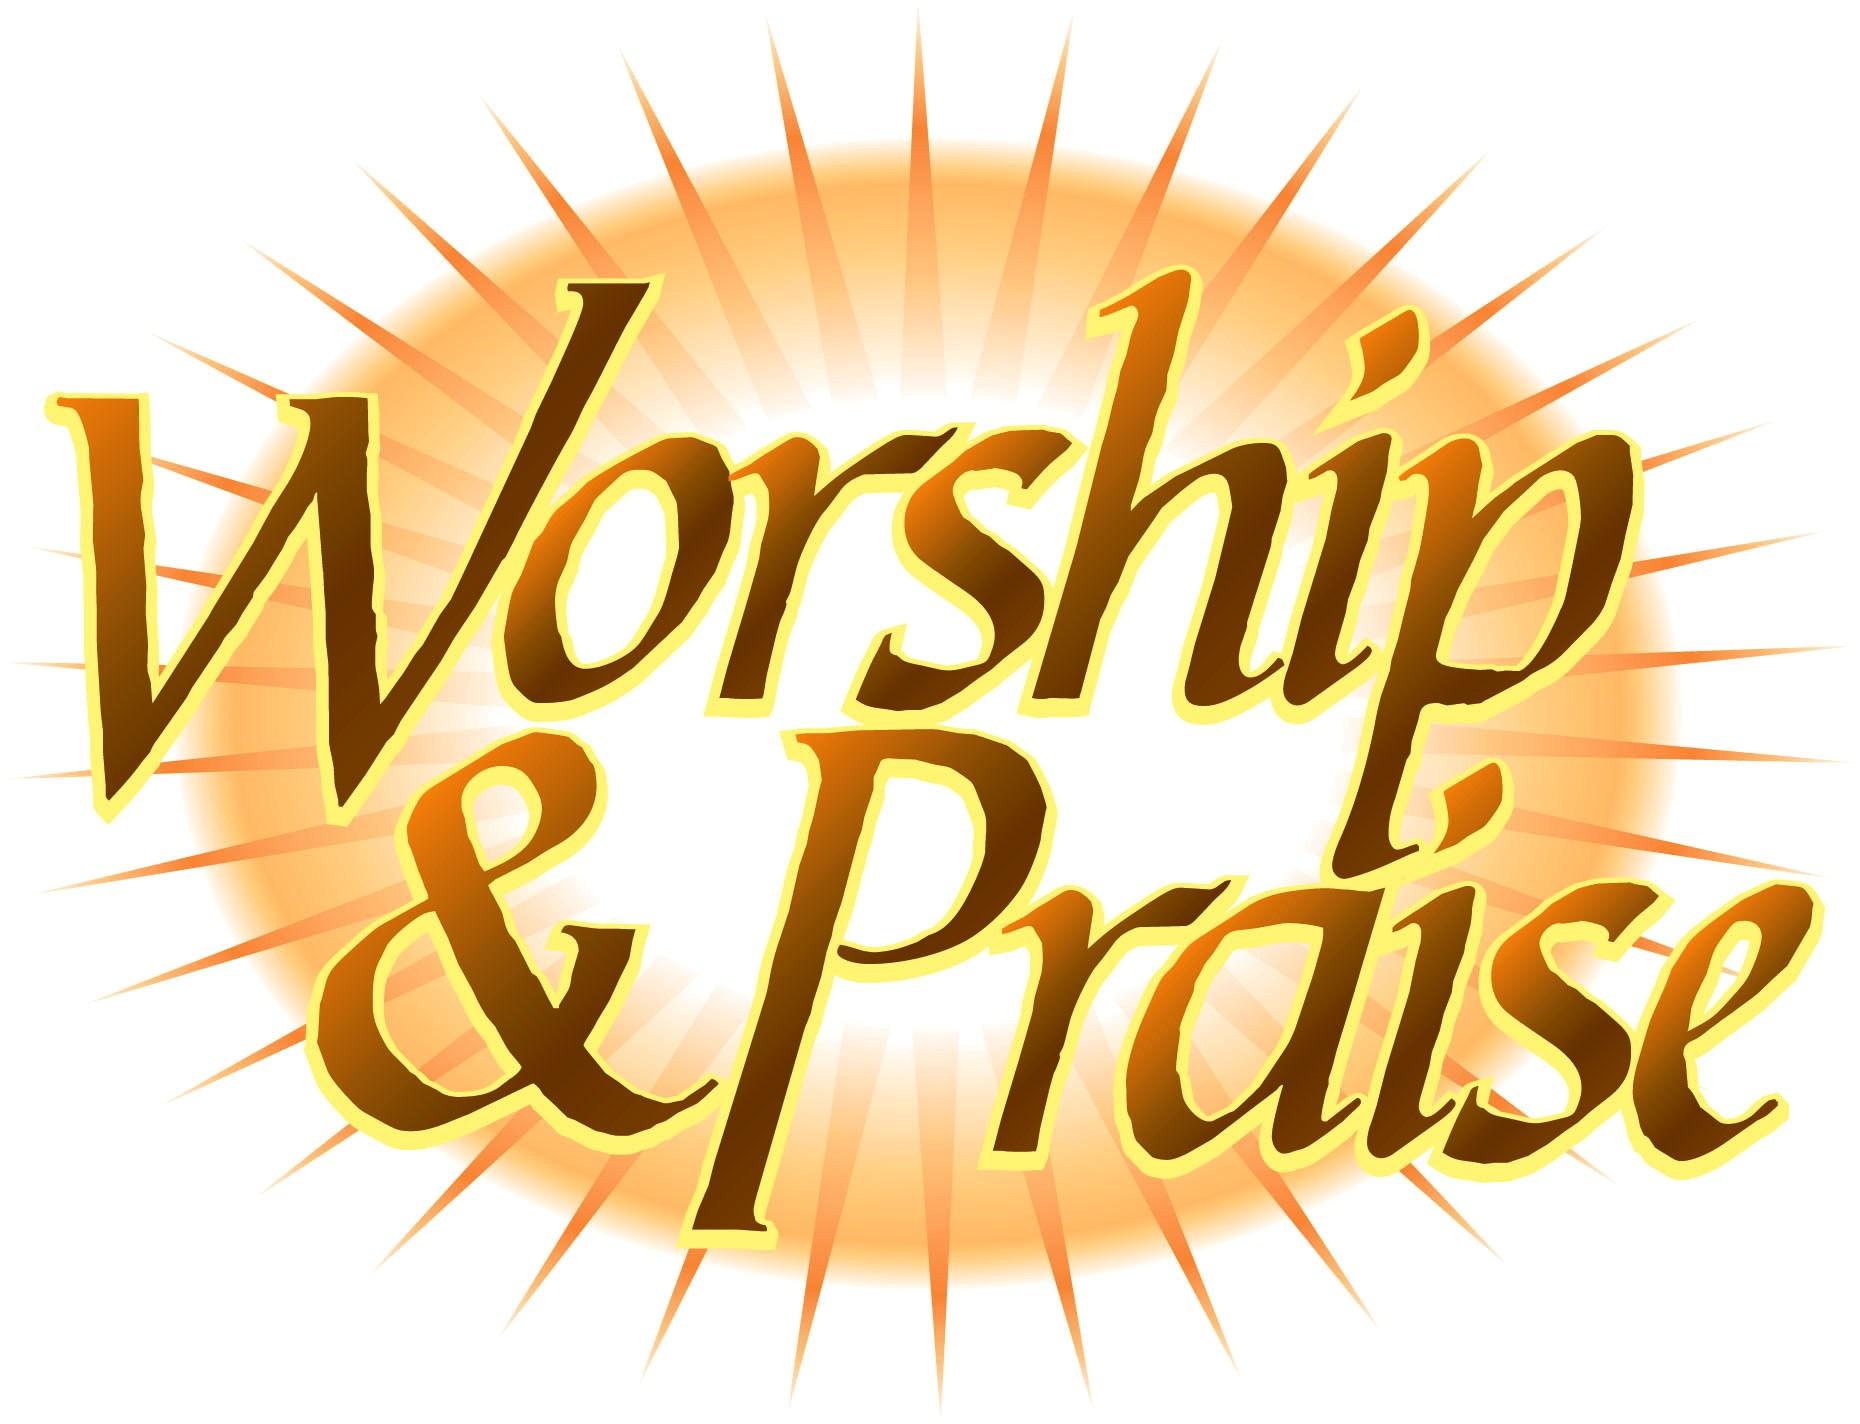 Praise And Worship Clip Art N2 free image.